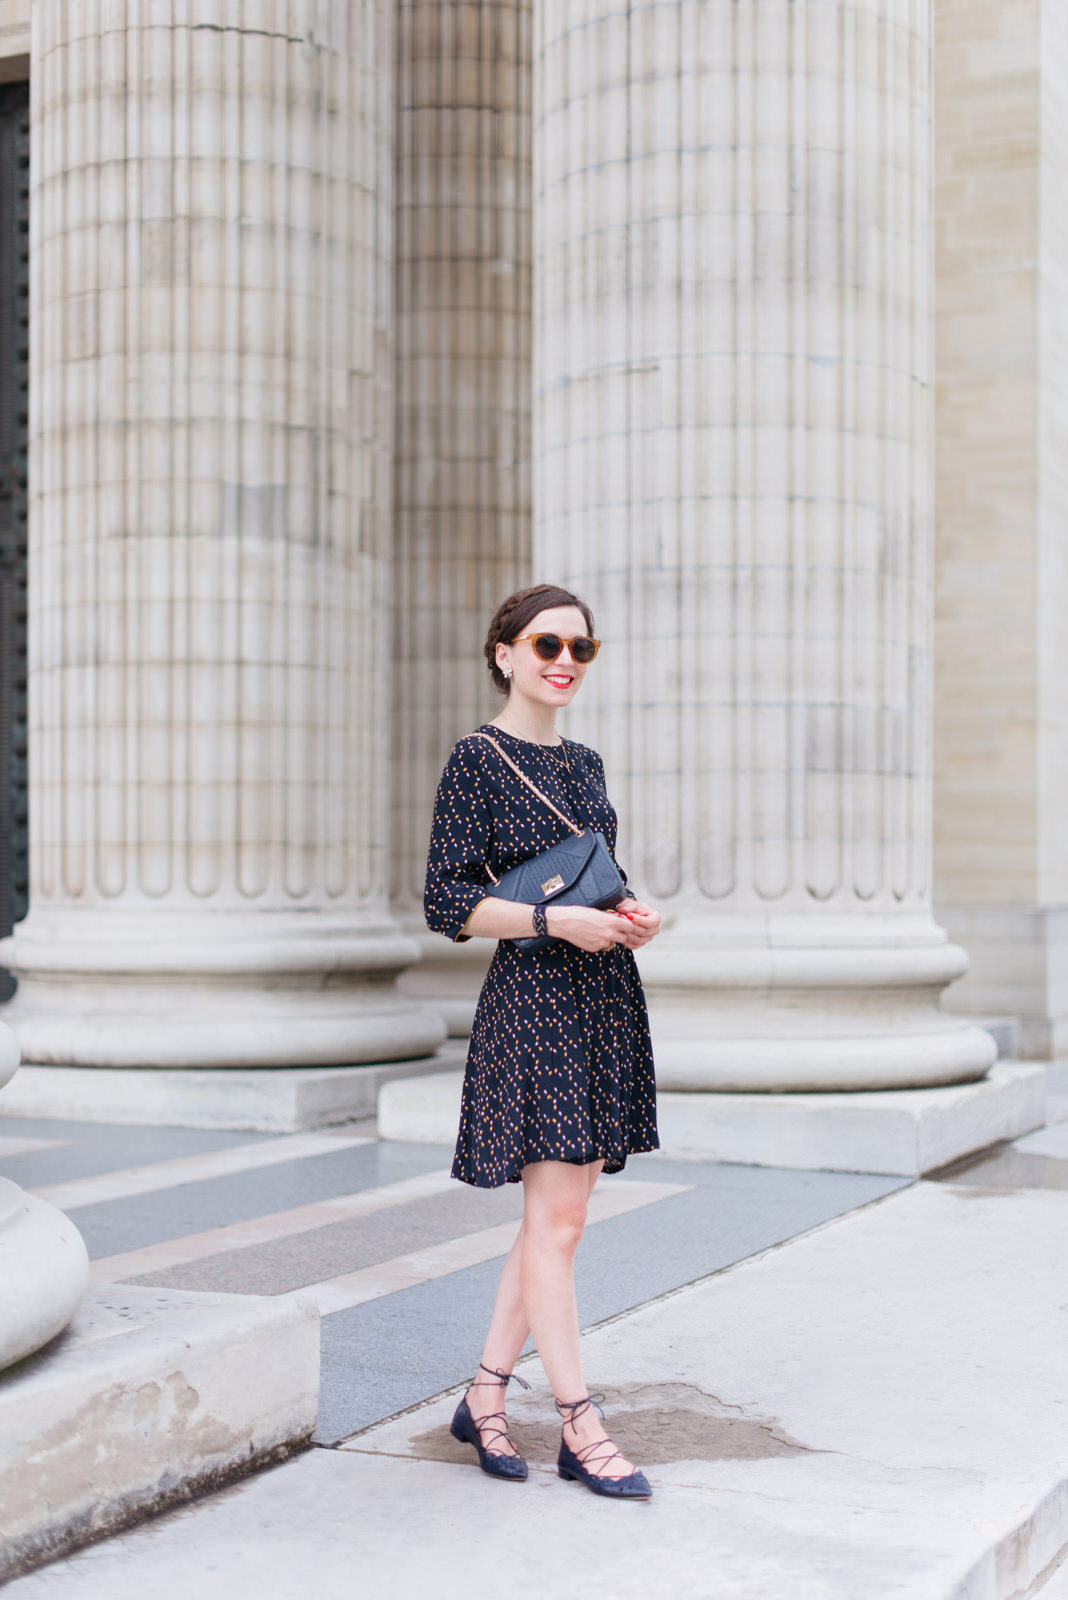 Blog-Mode-And-The-City-Looks-La-Petite-Francaise-5